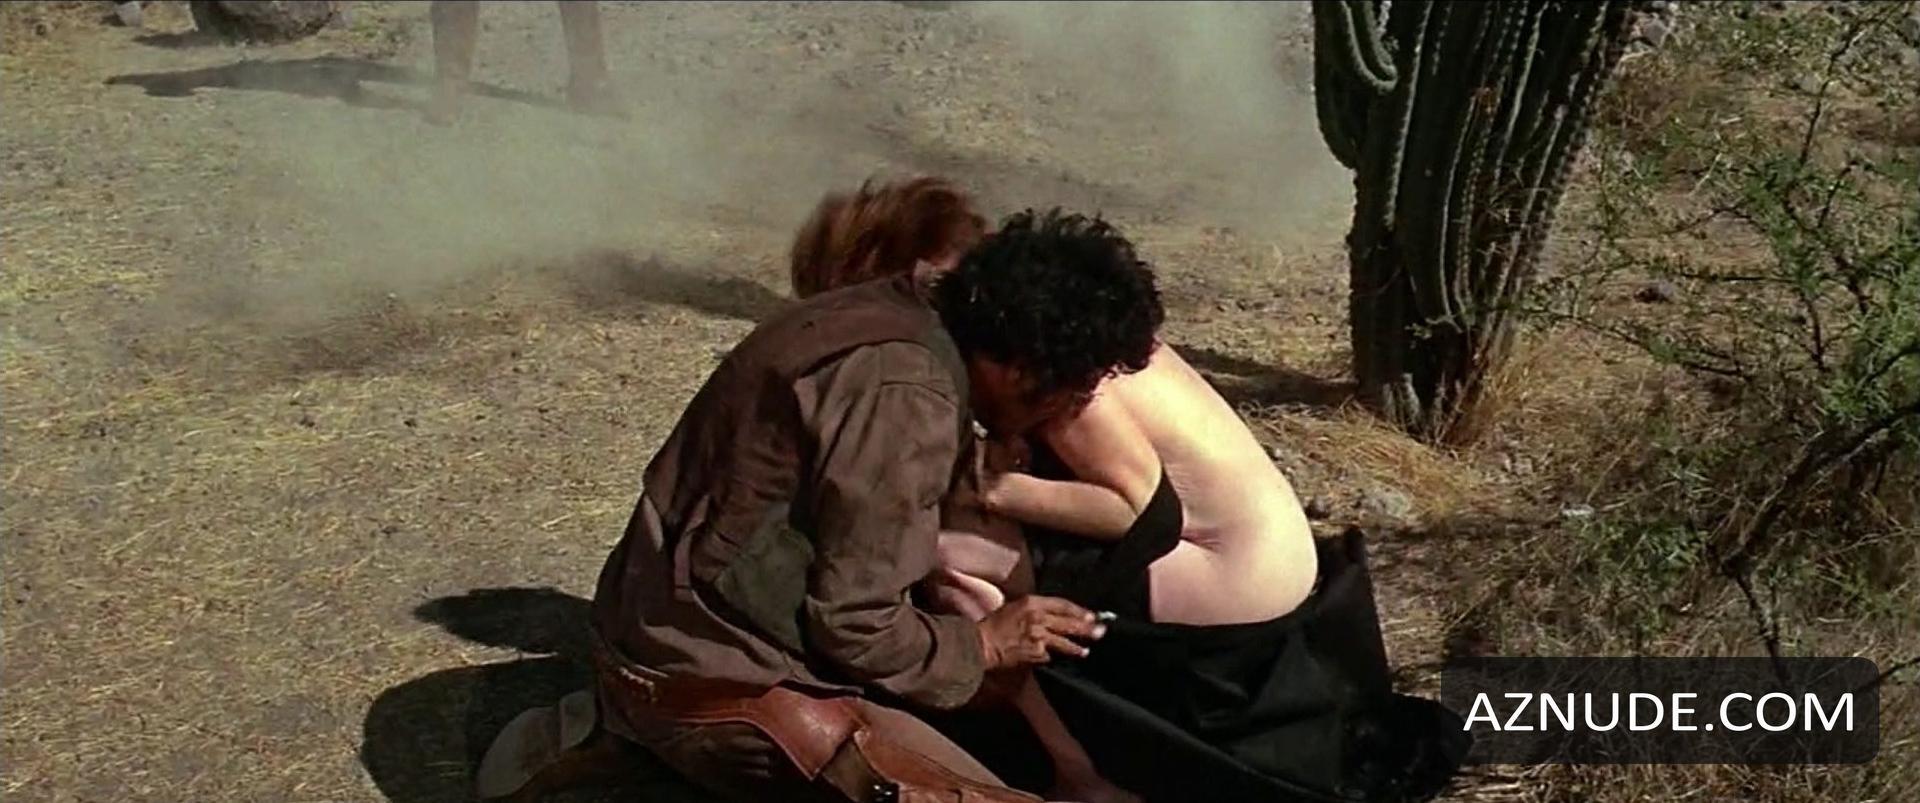 Two Mules For Sister Sara Nude Scenes - Aznude-9916